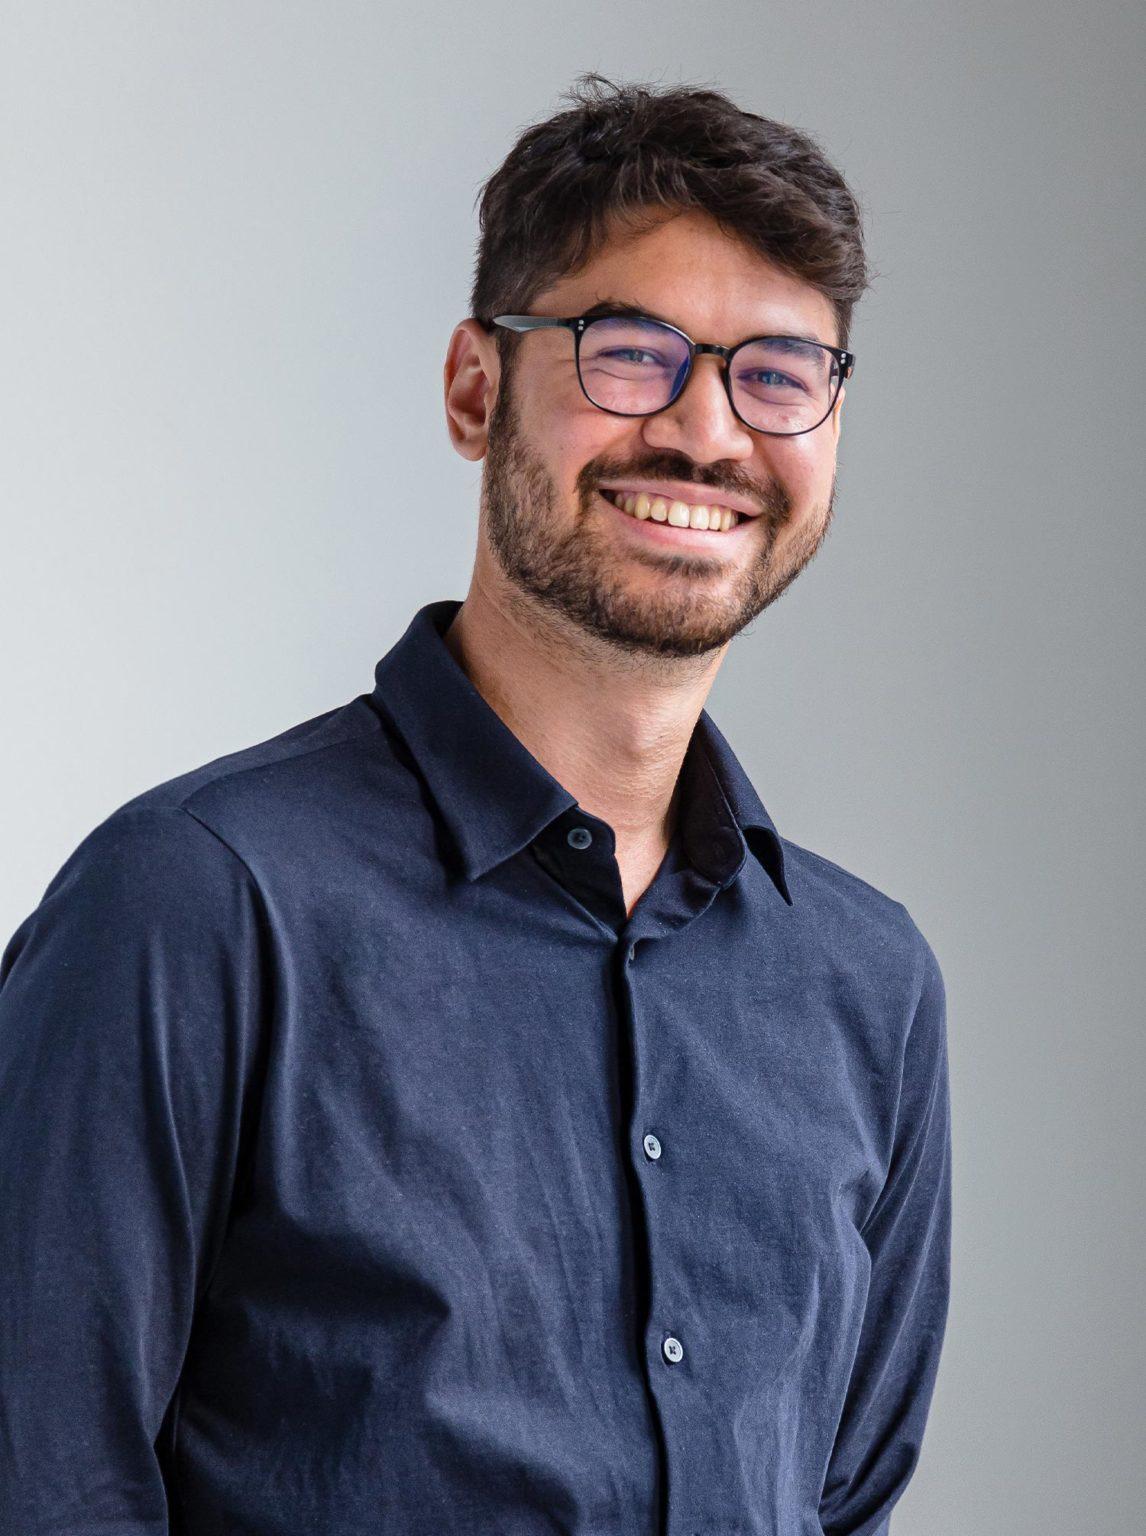 Stephan - Head of Online Marketing